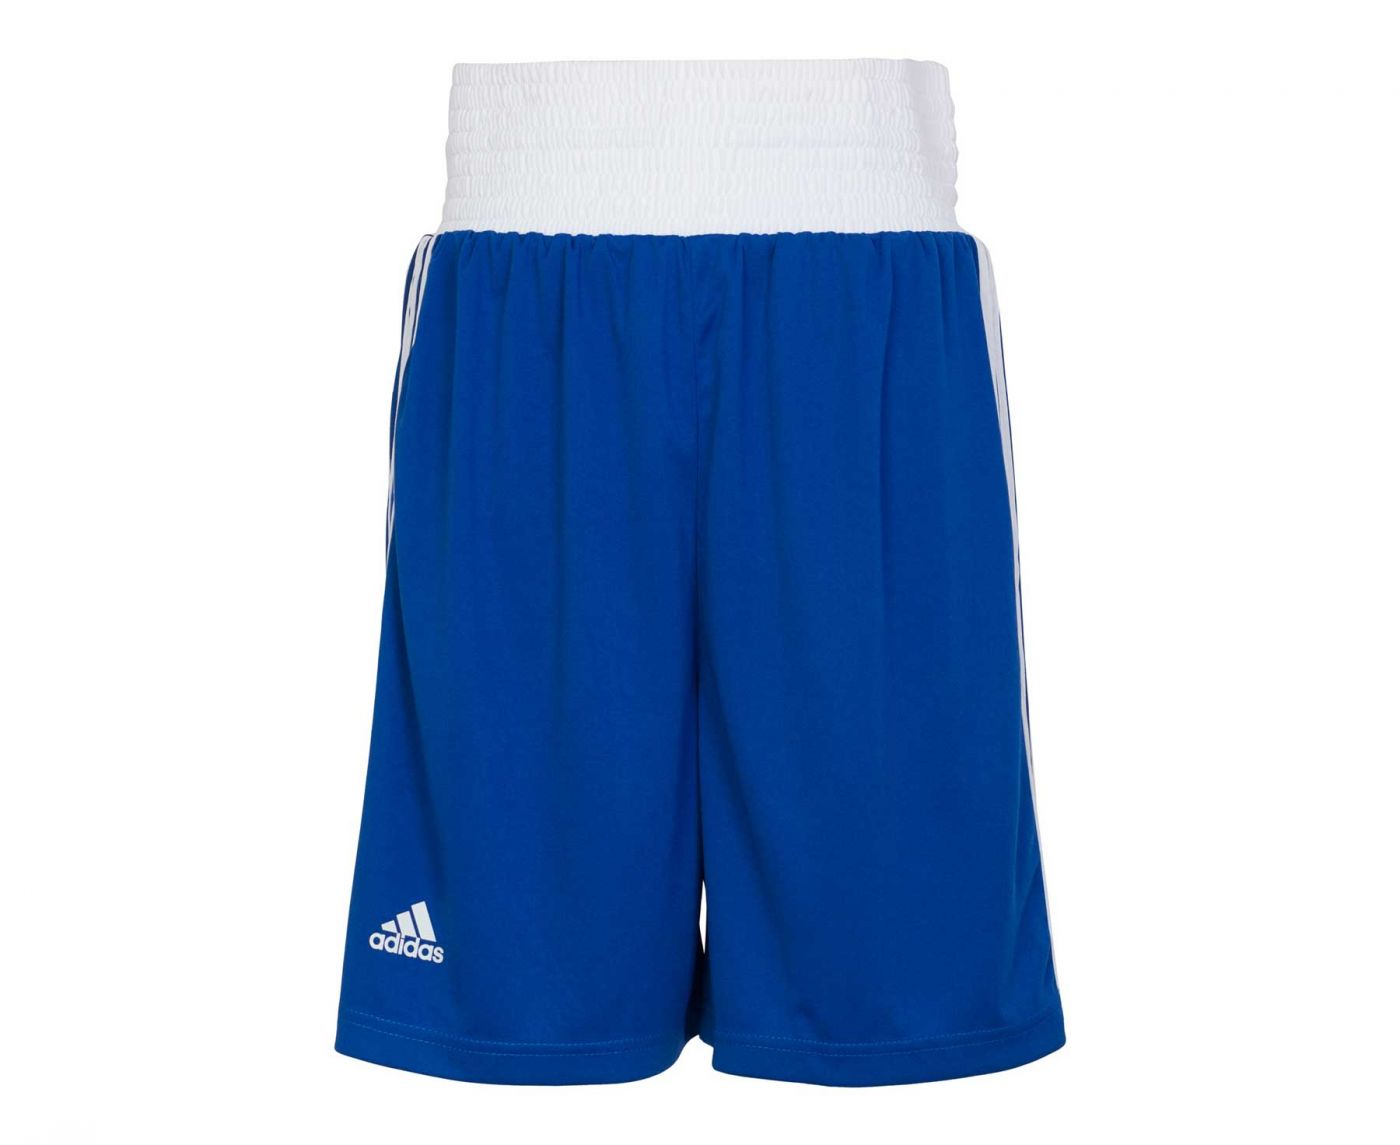 Шорты боксерские Adidas Boxing Short Punch Line синие, артикул adiBTS02